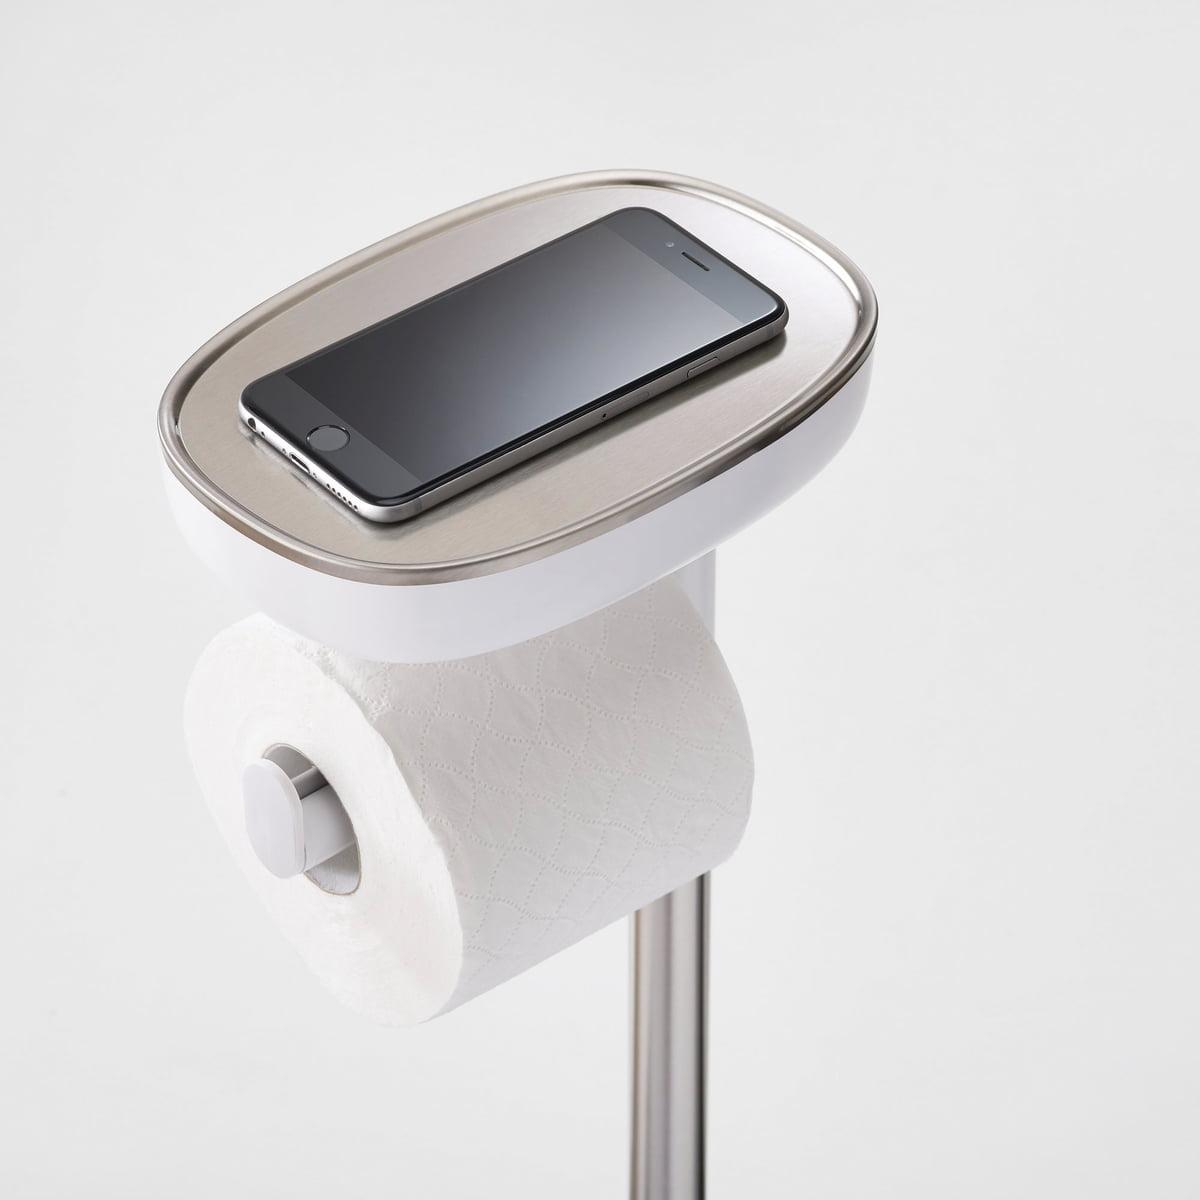 Joseph Joseph - EasyStore Toilettenpapierhalter| Edelstahl / weiß | Bad > Bad-Accessoires > Toilettenpapierhalter | Joseph Joseph